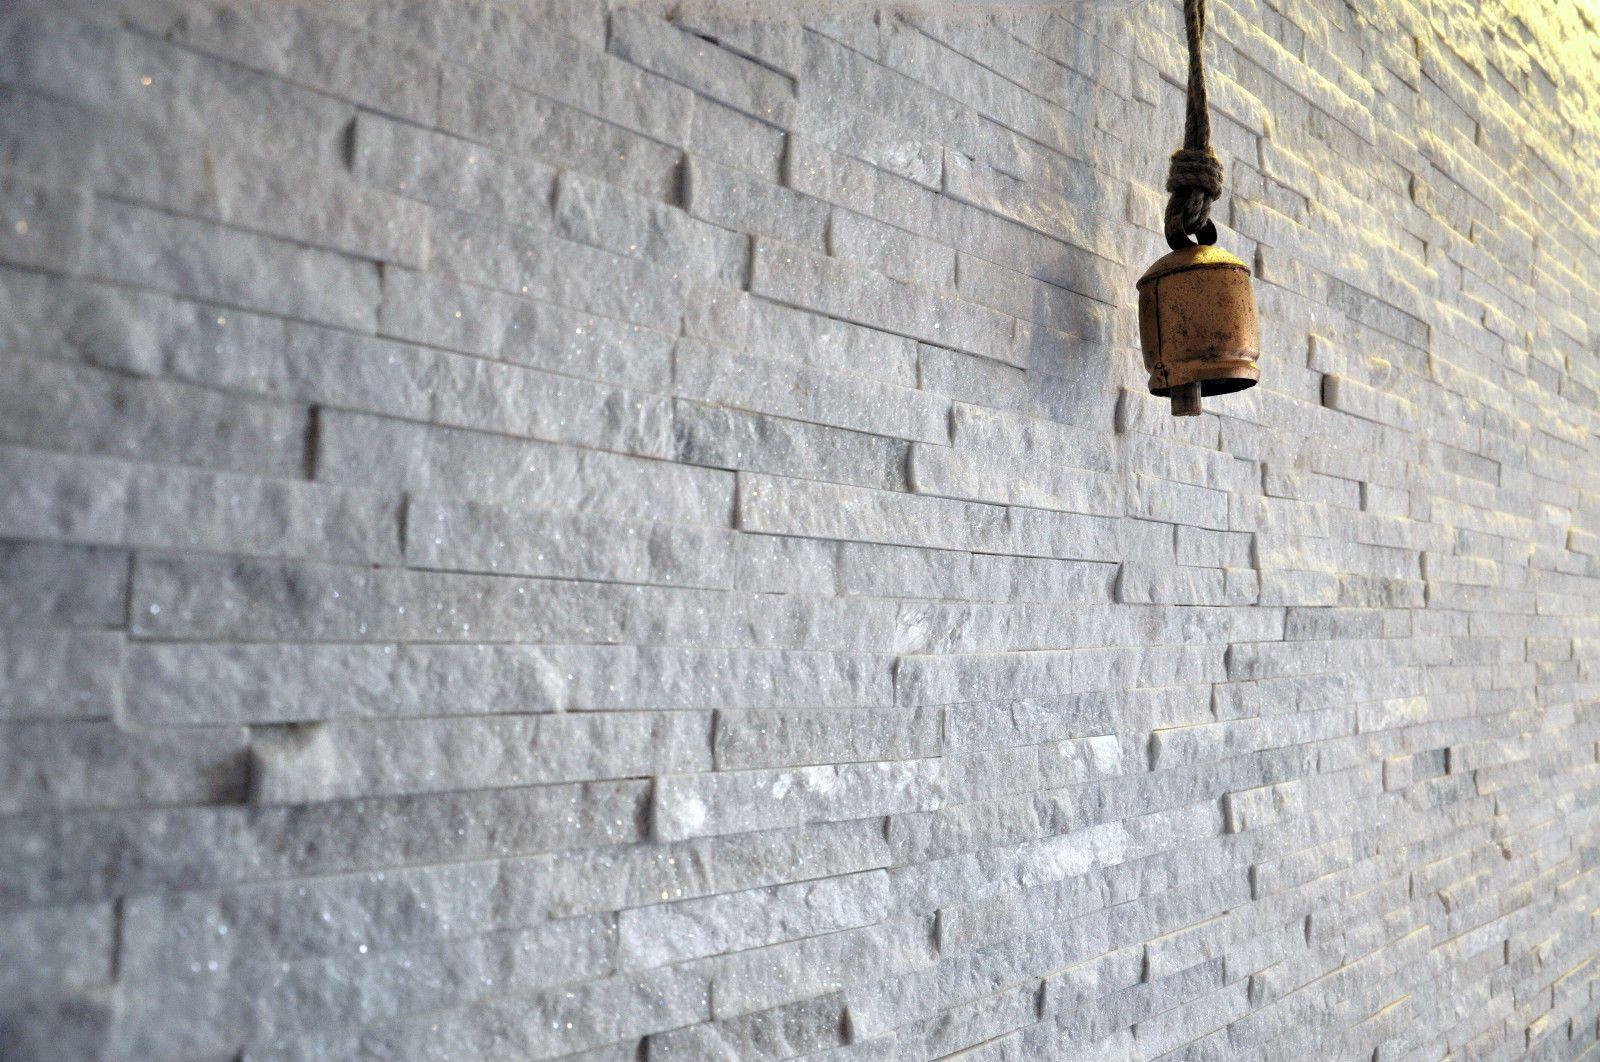 Split Face Natural Stone White Quartz Wall Cladding Tiles 3d Stacked Sparkle Ebay Quartz Wall Tiles Wall Cladding Tile Cladding